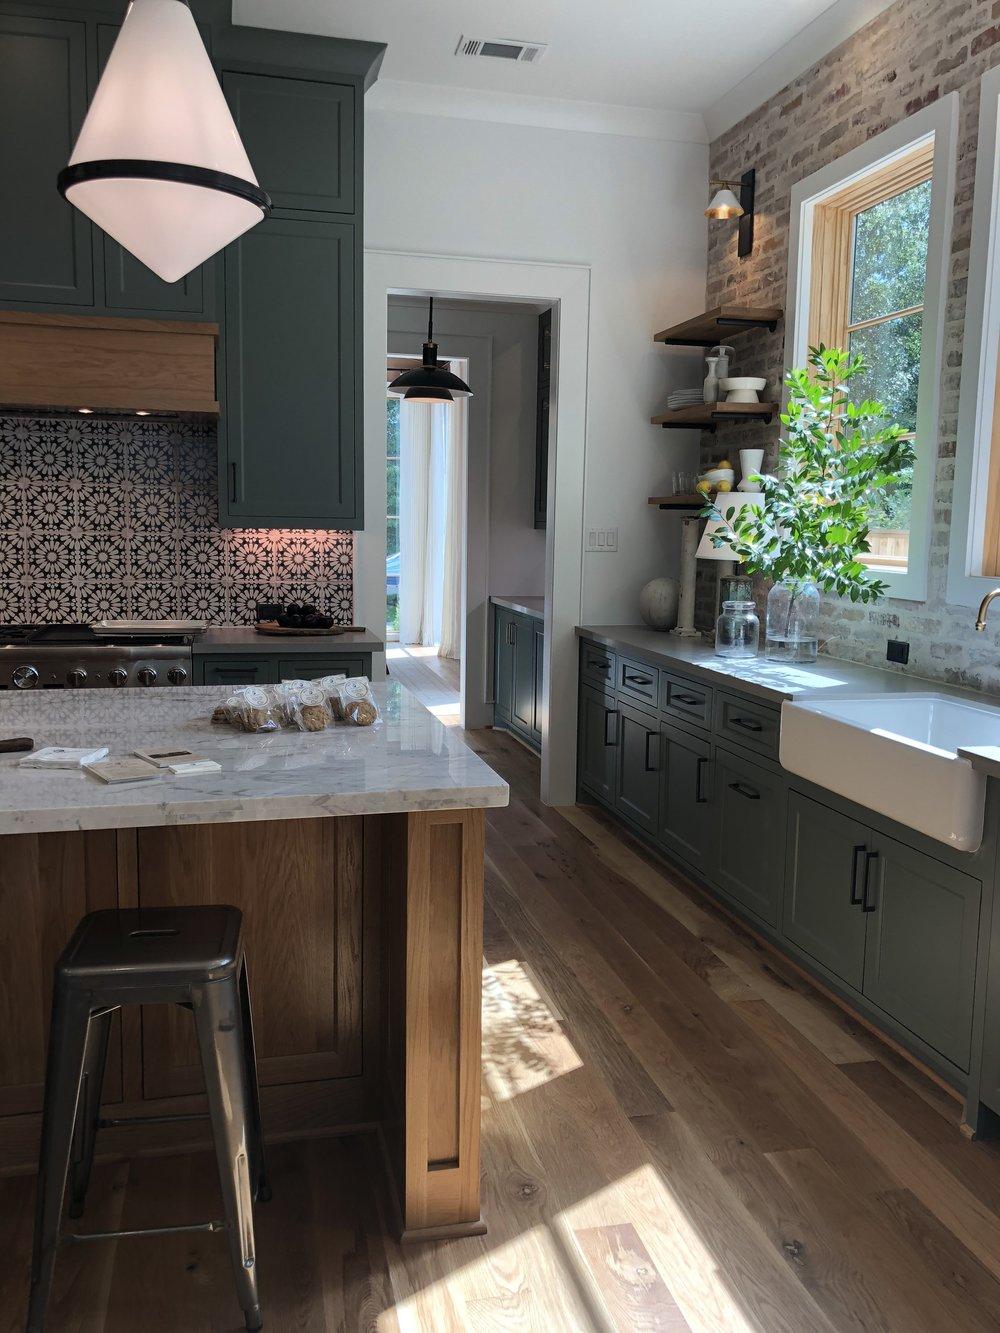 Kitchen by Meg Lonergan